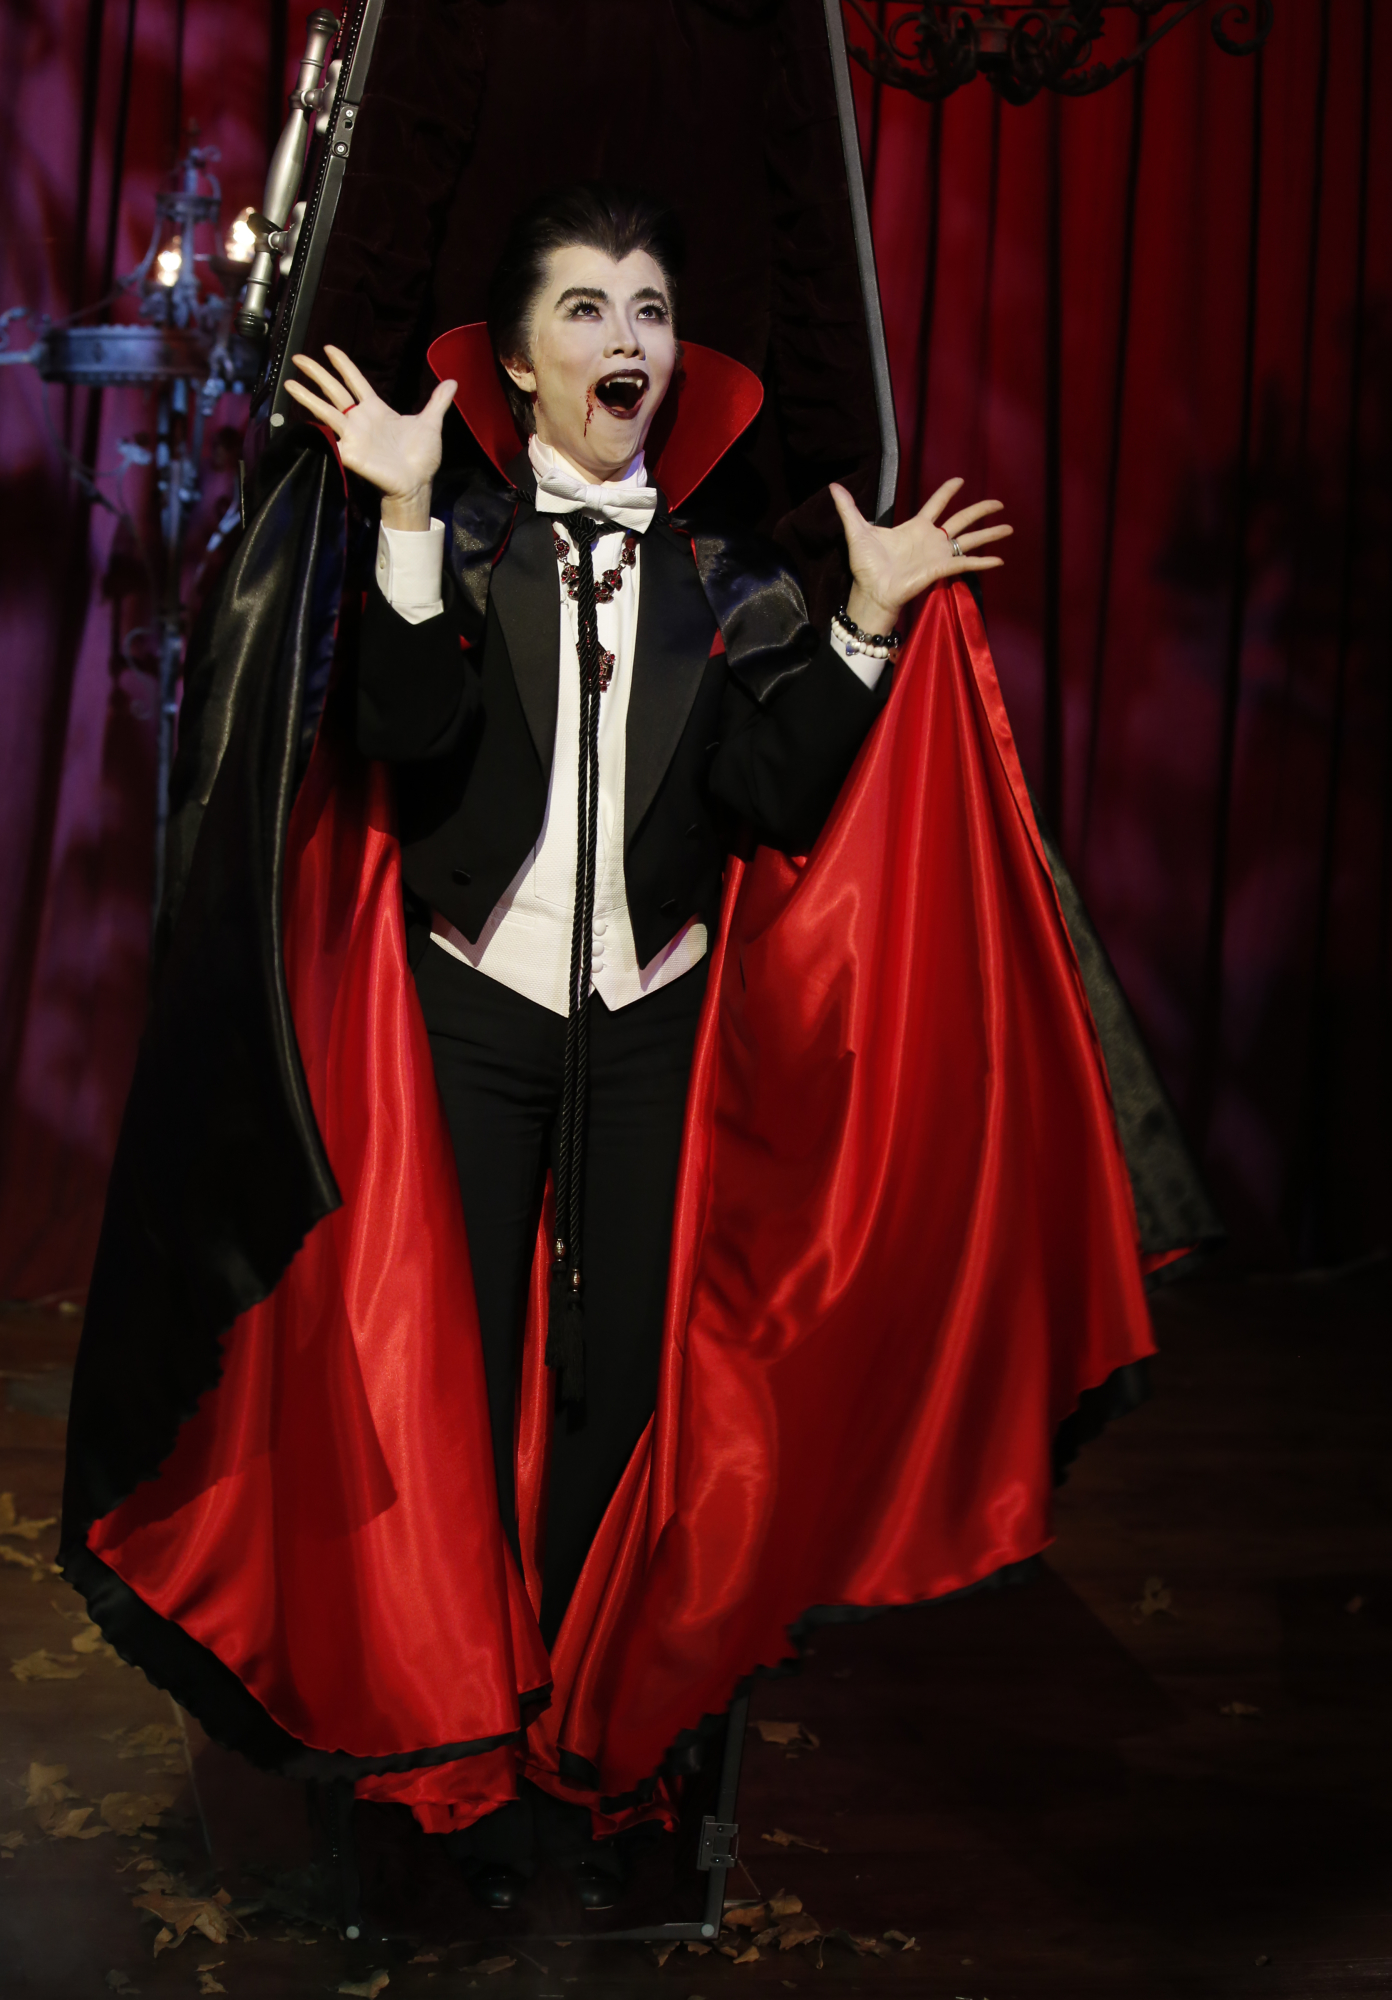 10. She pulls off a killer Dracula.